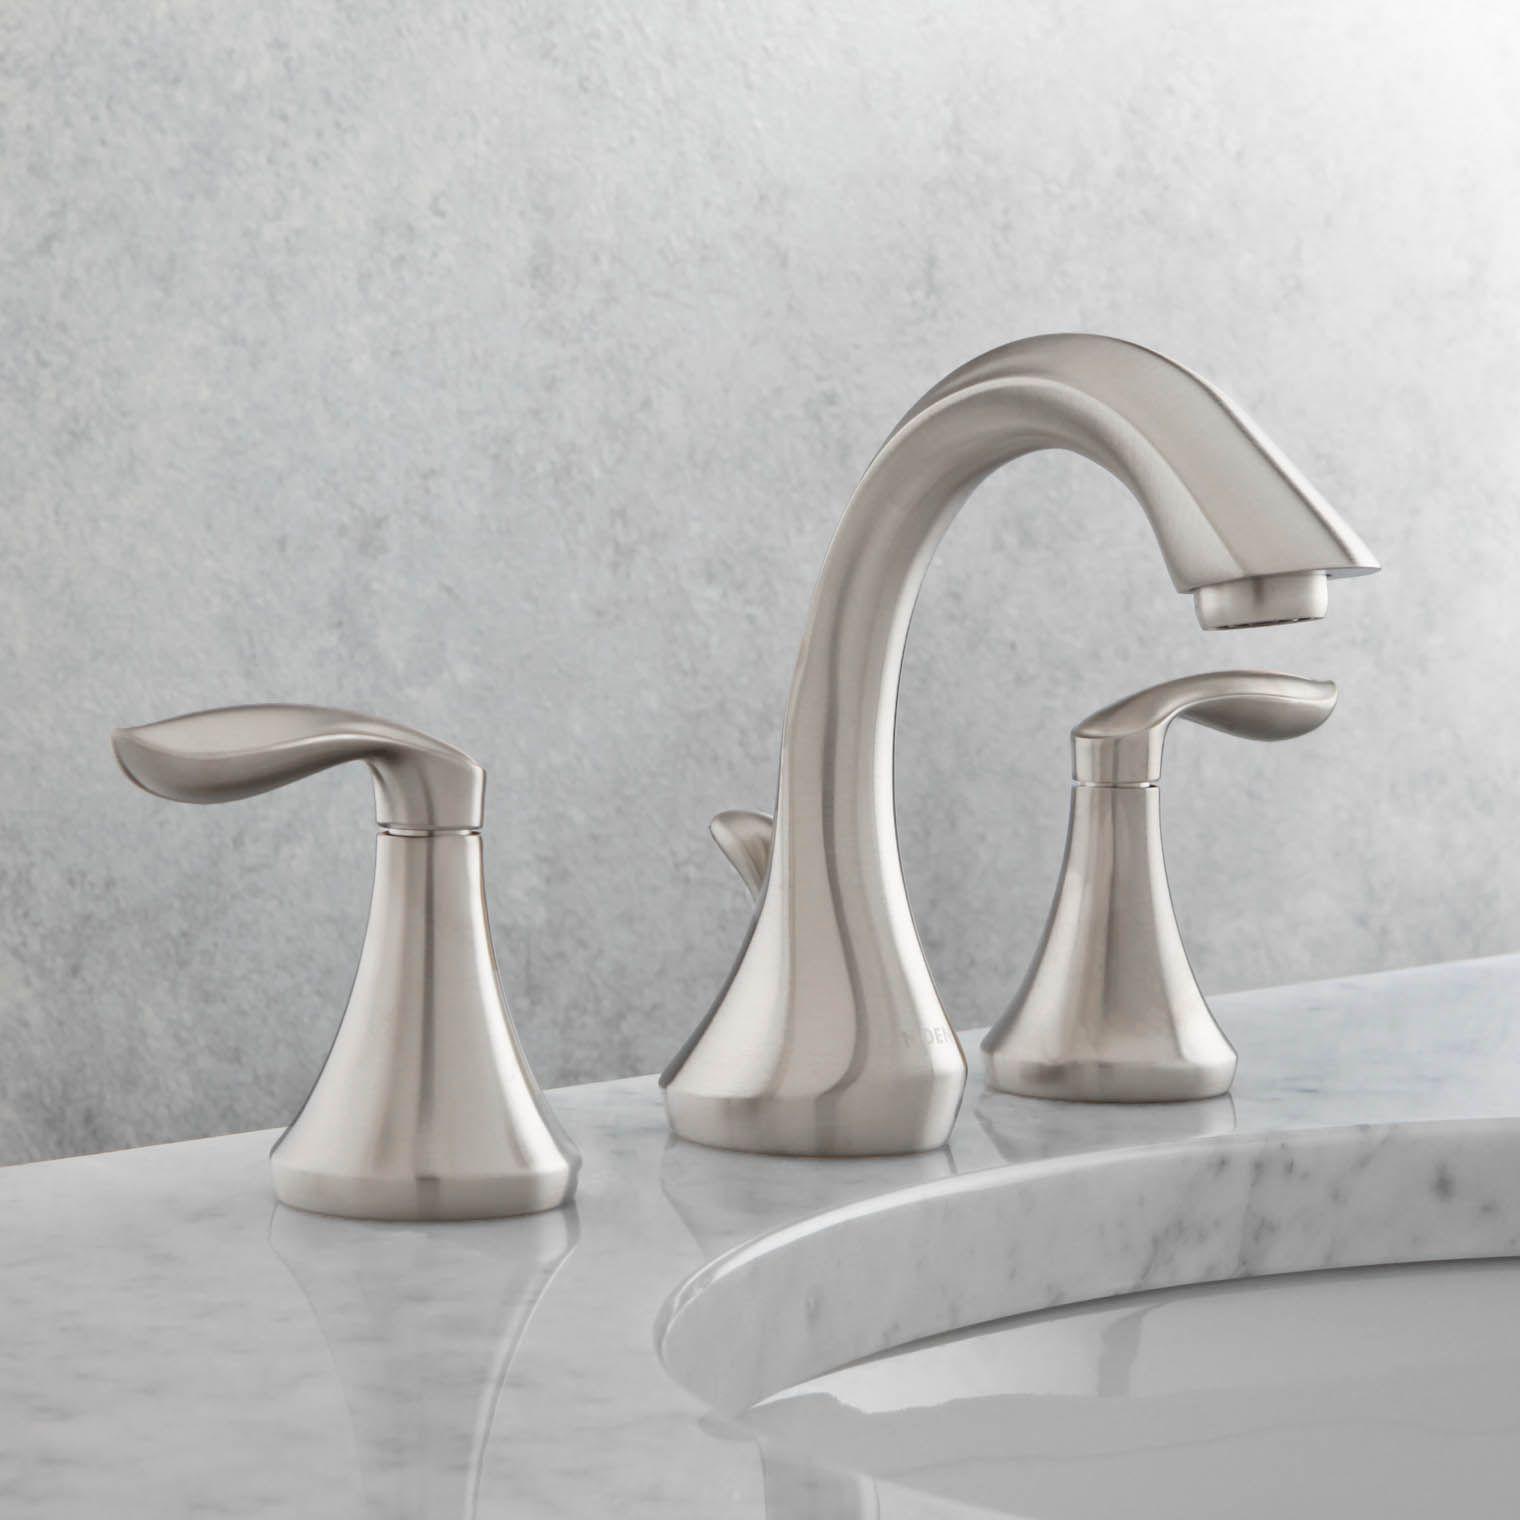 Moen T6420bn Eva Two Handle Widespread Bathroom Faucet Select Pinterest